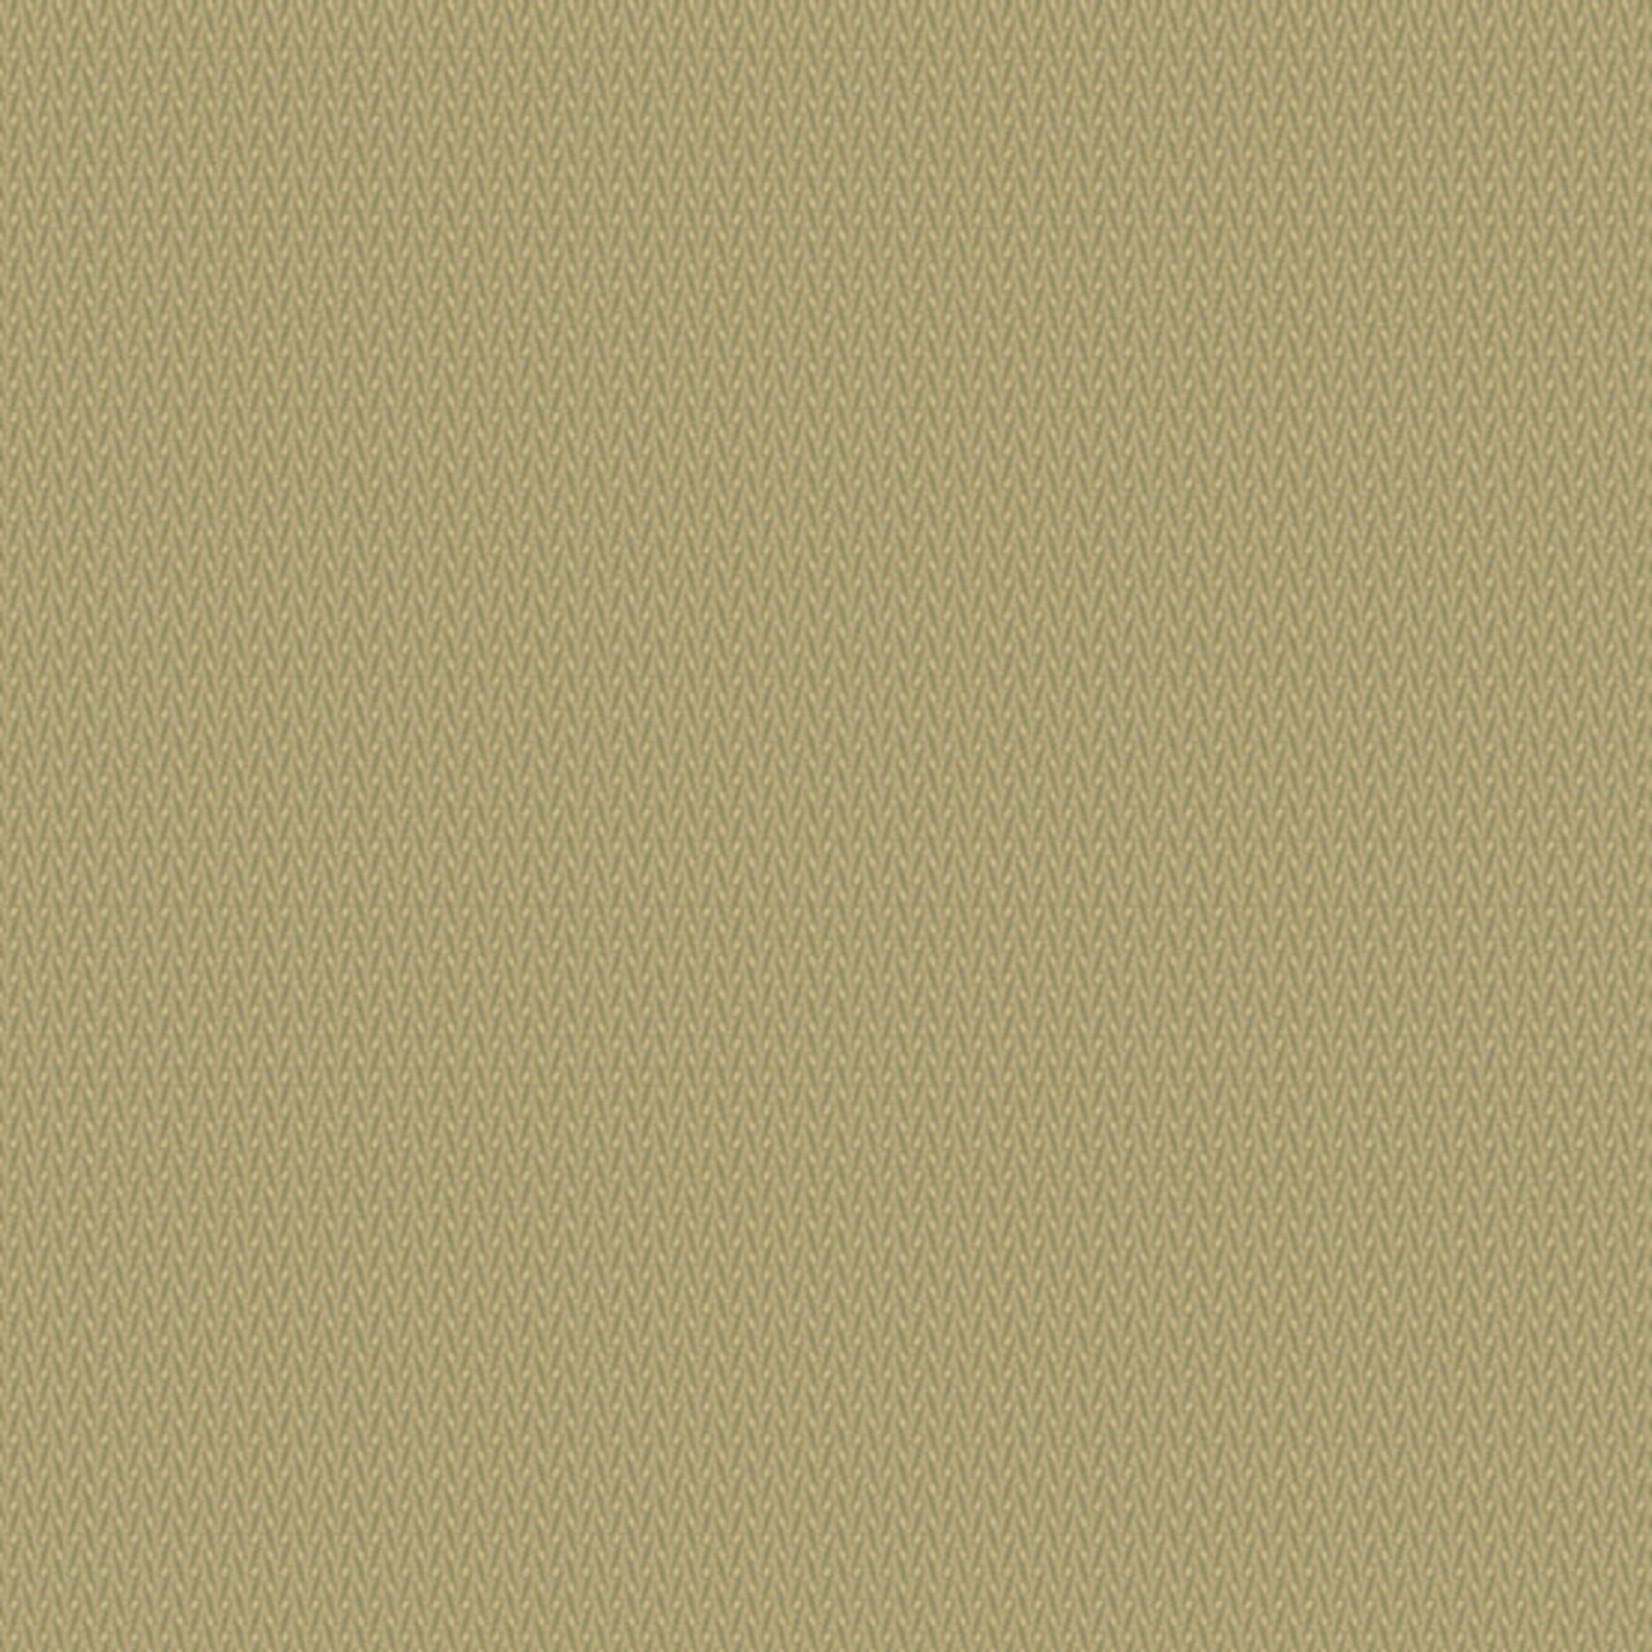 Edyta Sitar Secret Stash - Neutrals, Elegant Burlap, Tan (8626-N) $0.20 per cm or $20/m